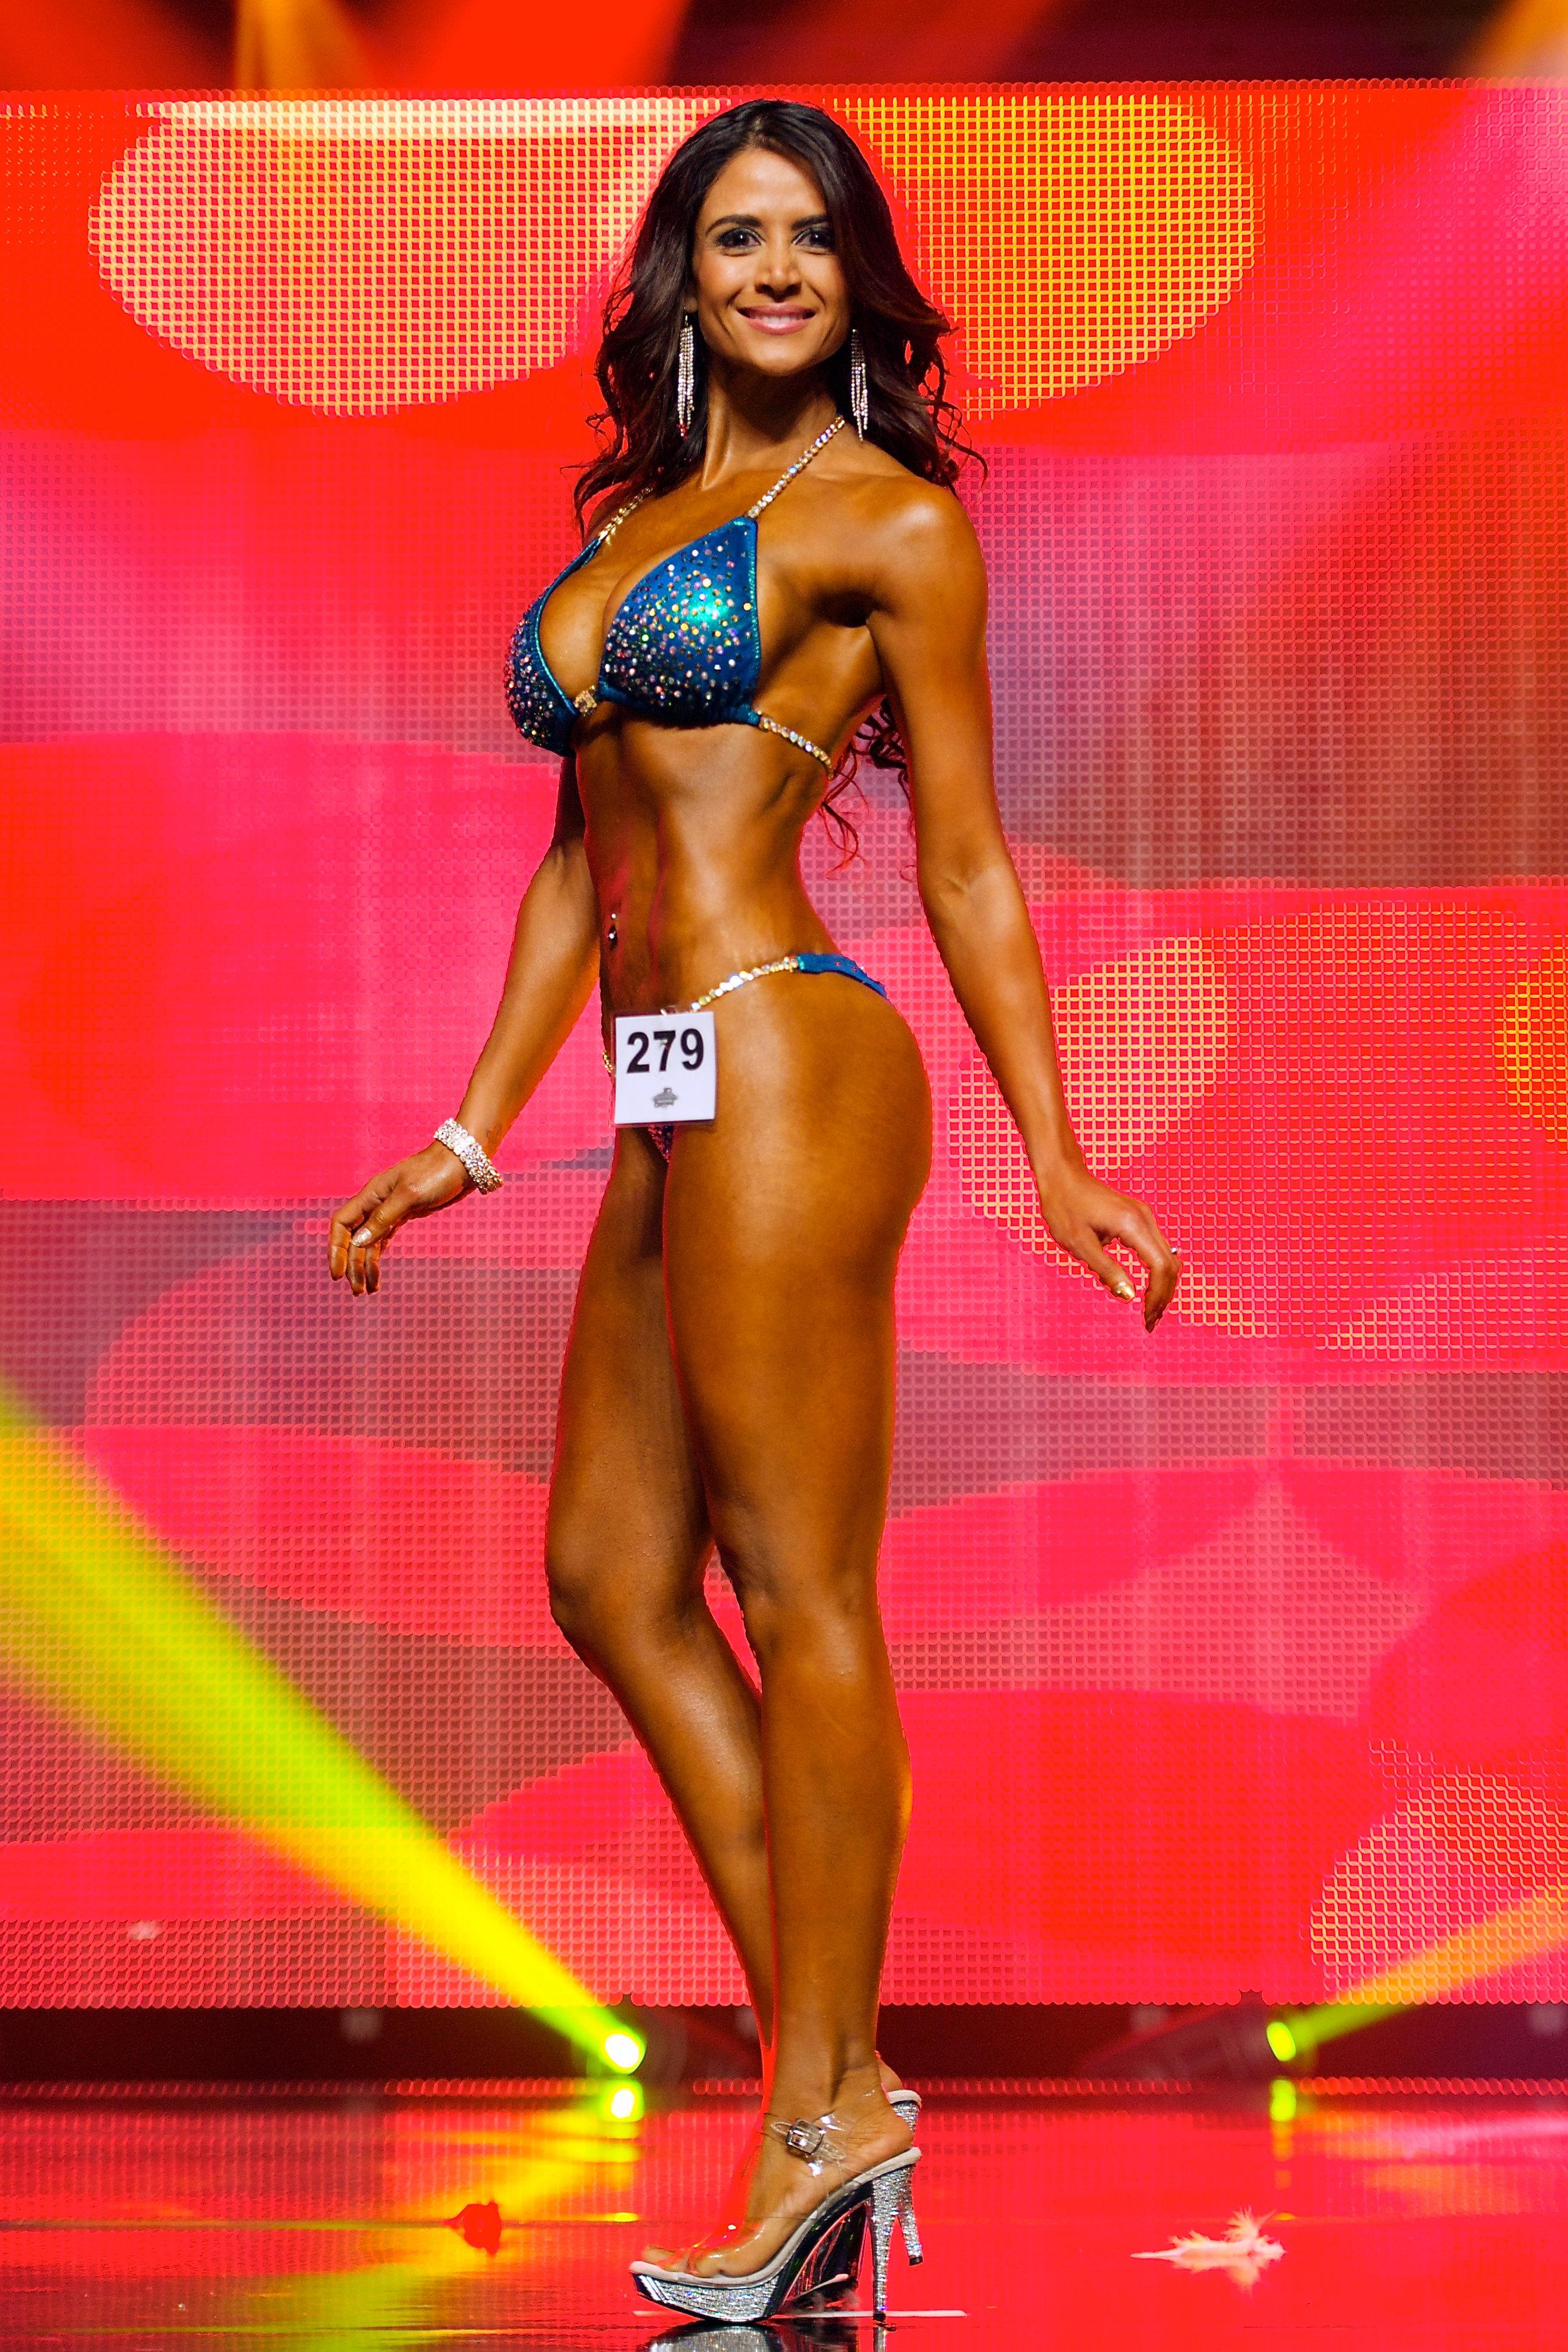 DSC_7603.JPG Peggy Barrios 2016 Fitness America Weekend by Gordon J. Smith.jpg